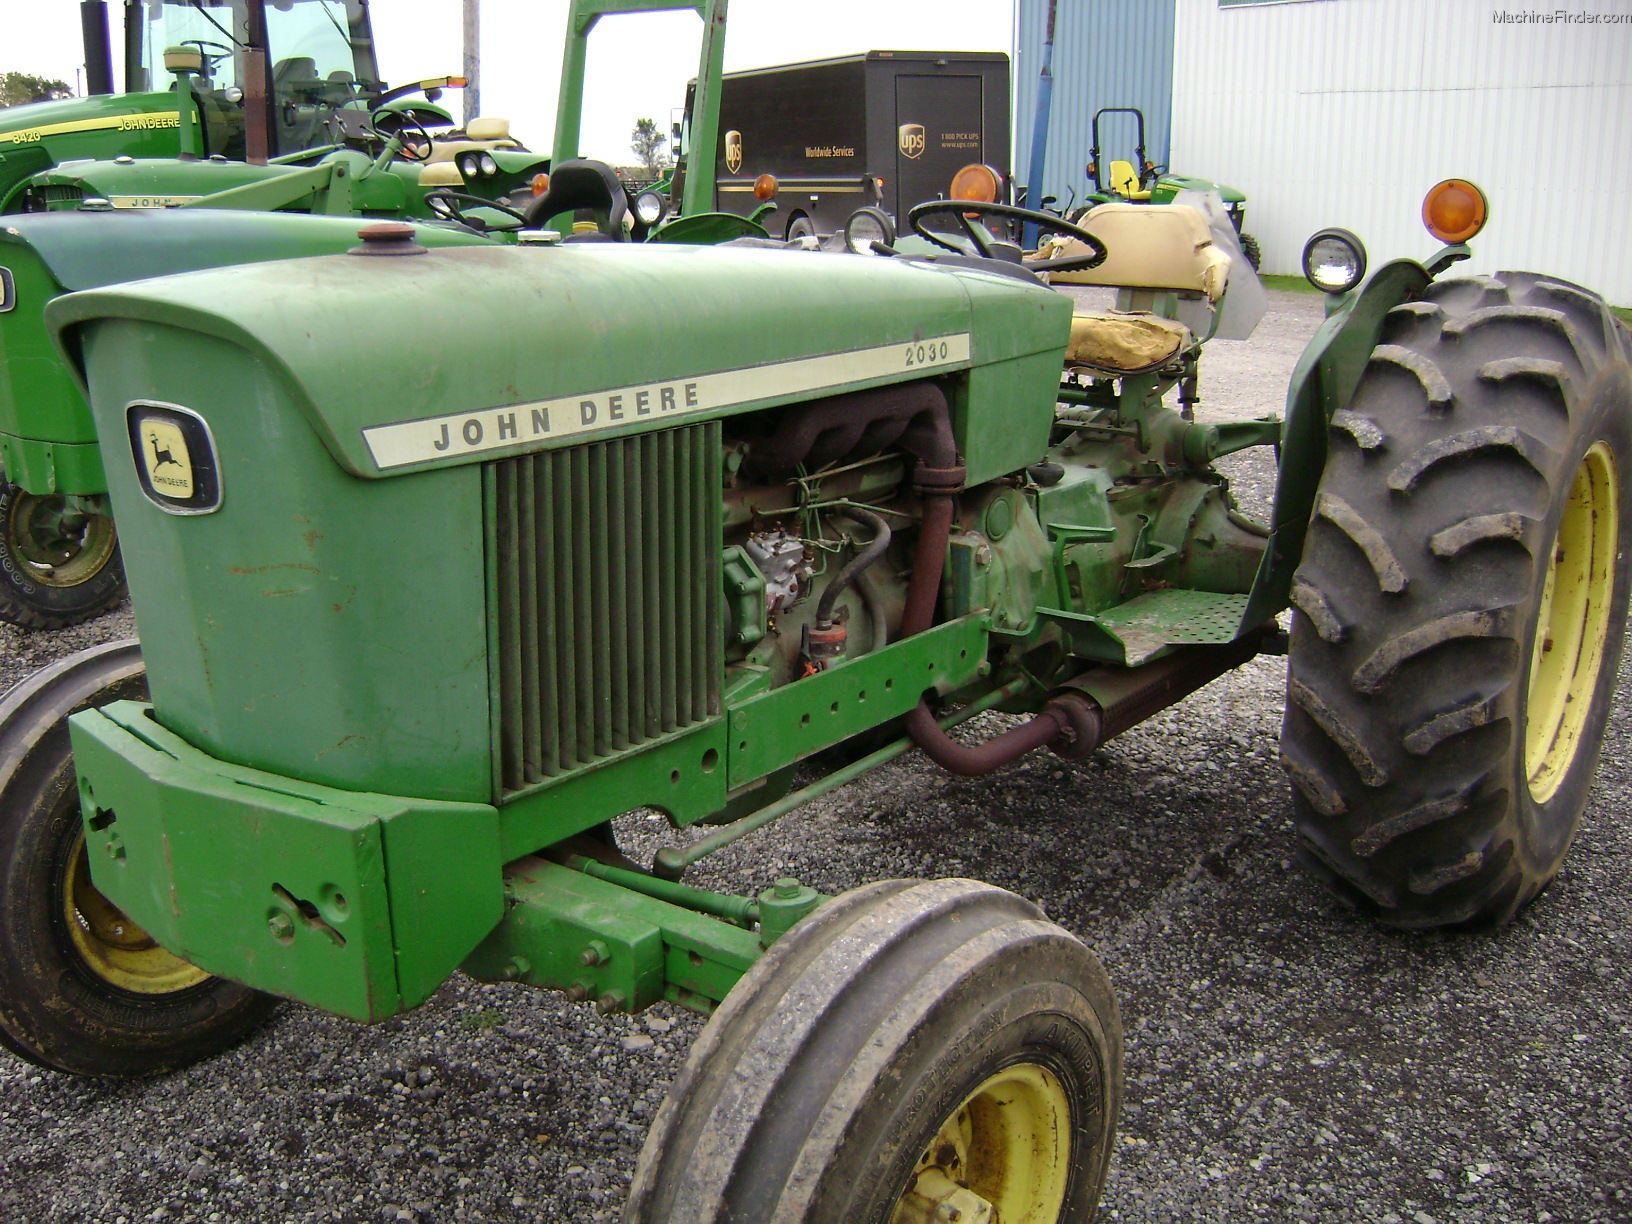 1973 John Deere 2030 Tractors - Utility (40-100hp) - John ...